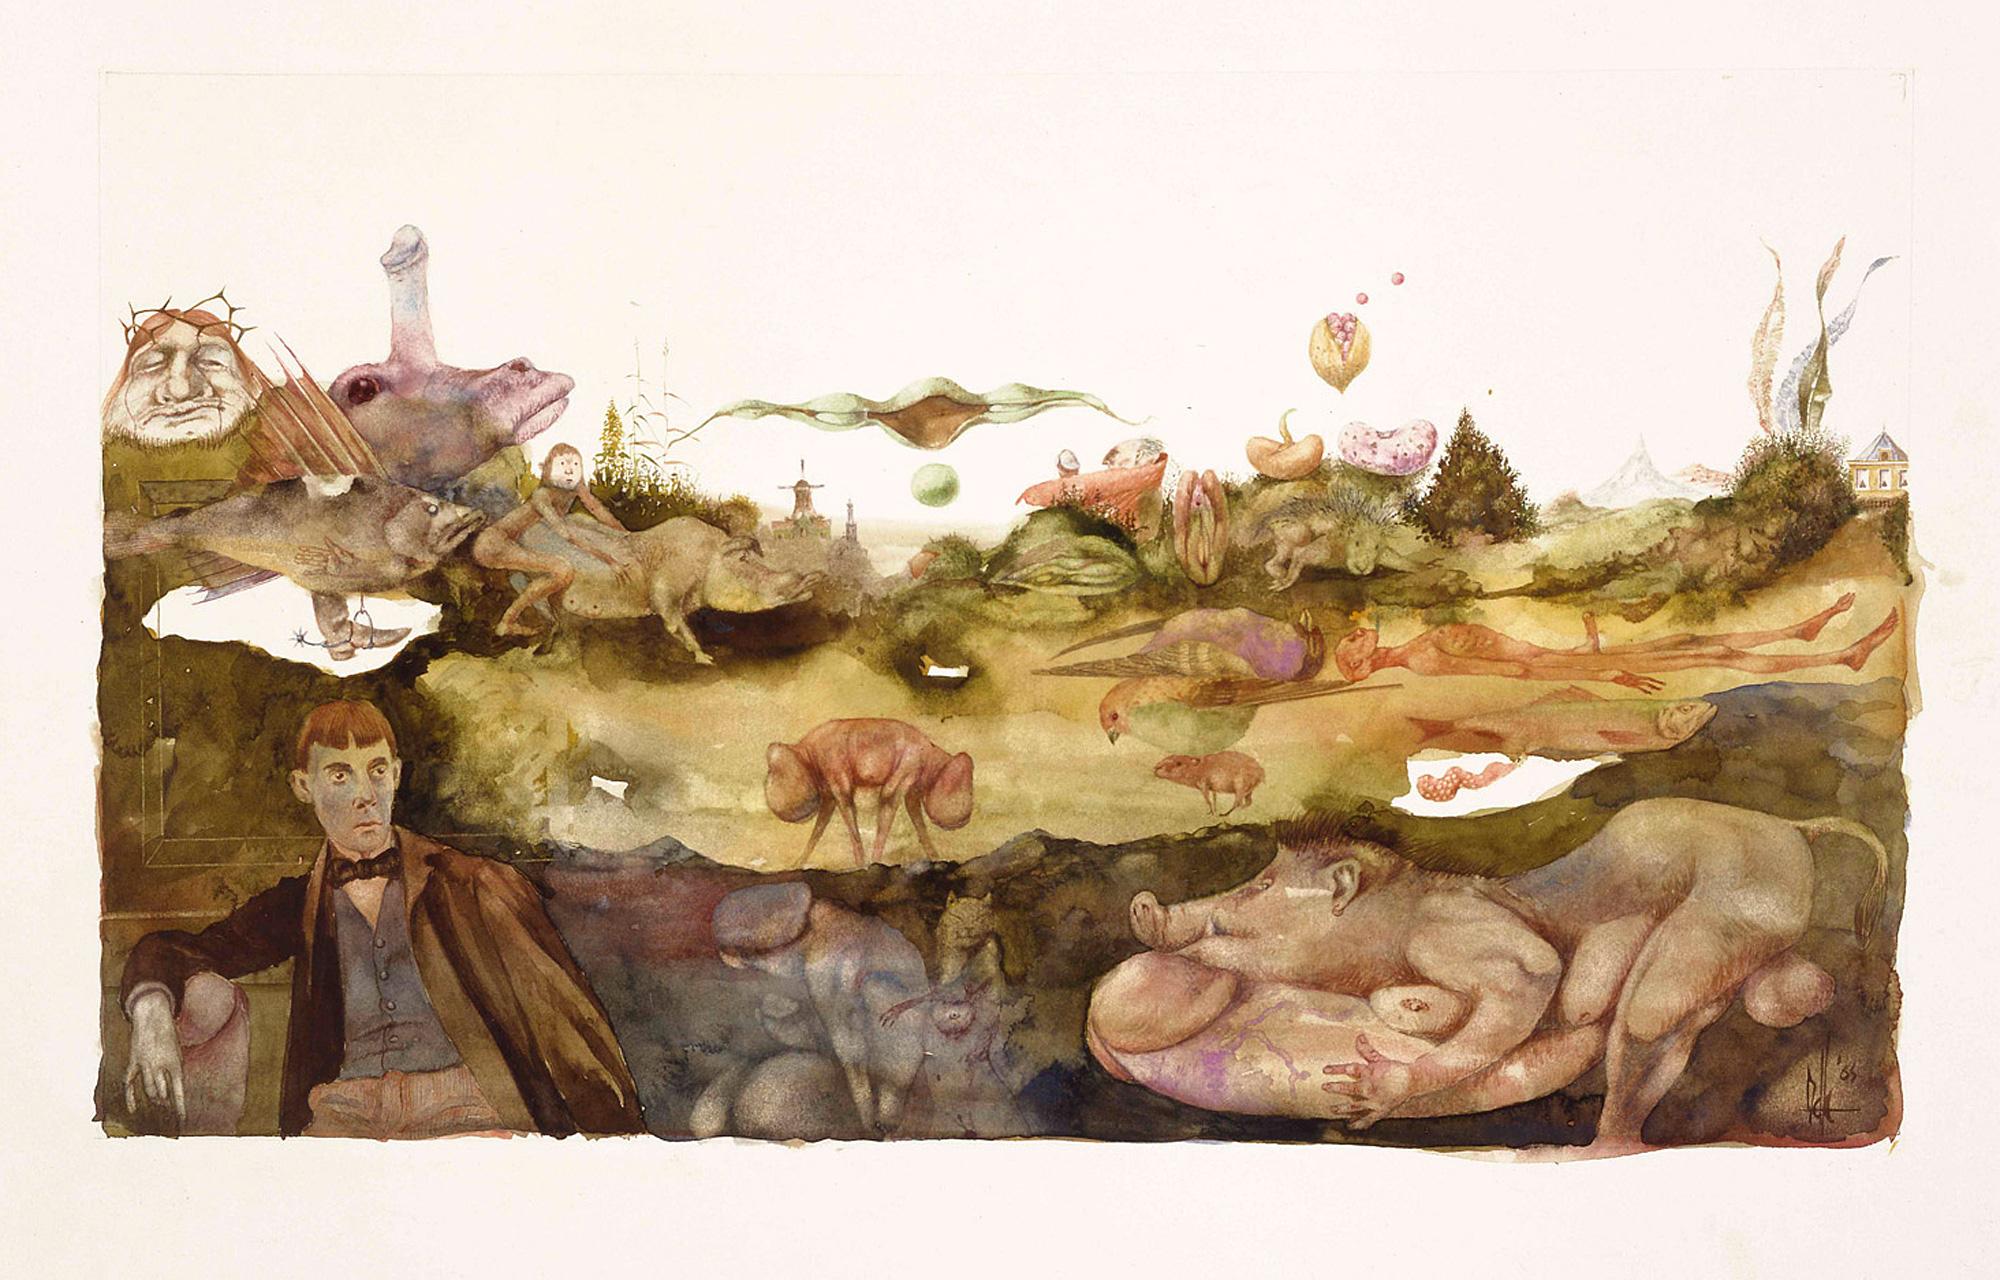 Melle schilder | Hommage to Beardsley, aquarelverf op papier